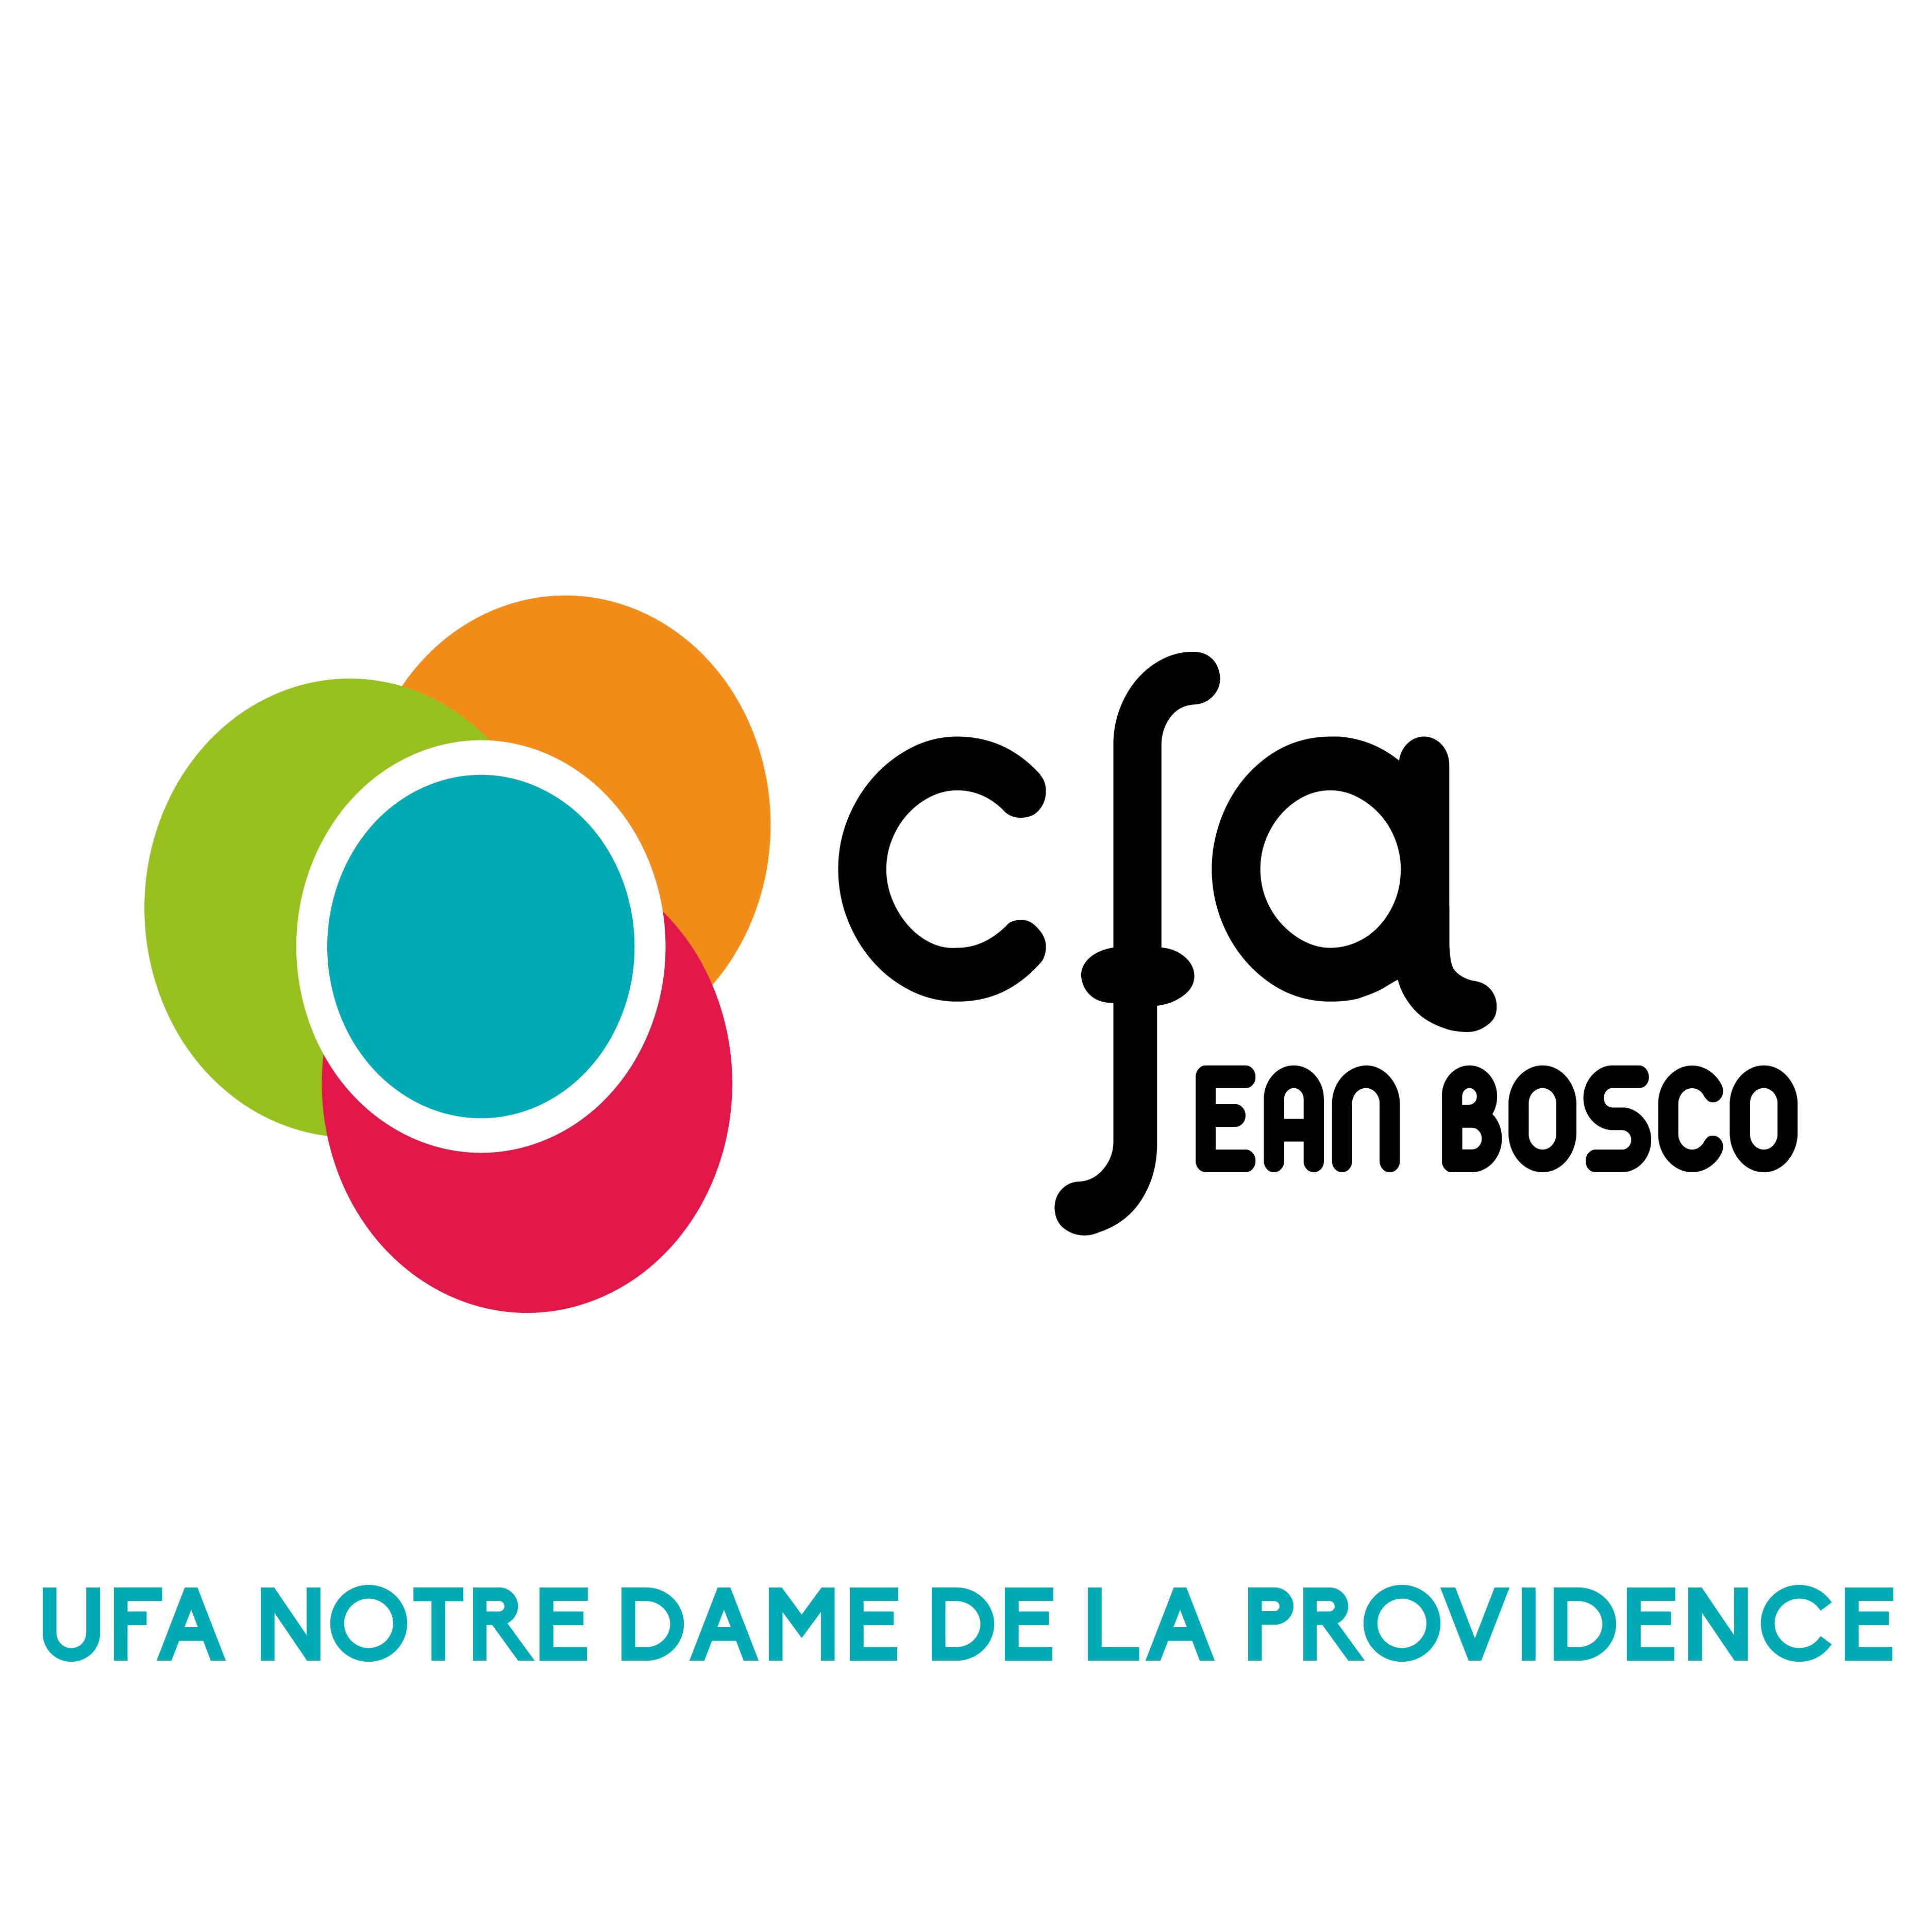 LOGO CFA-NOTRE-DAME-DE-LA-PROVIDENCE-34.